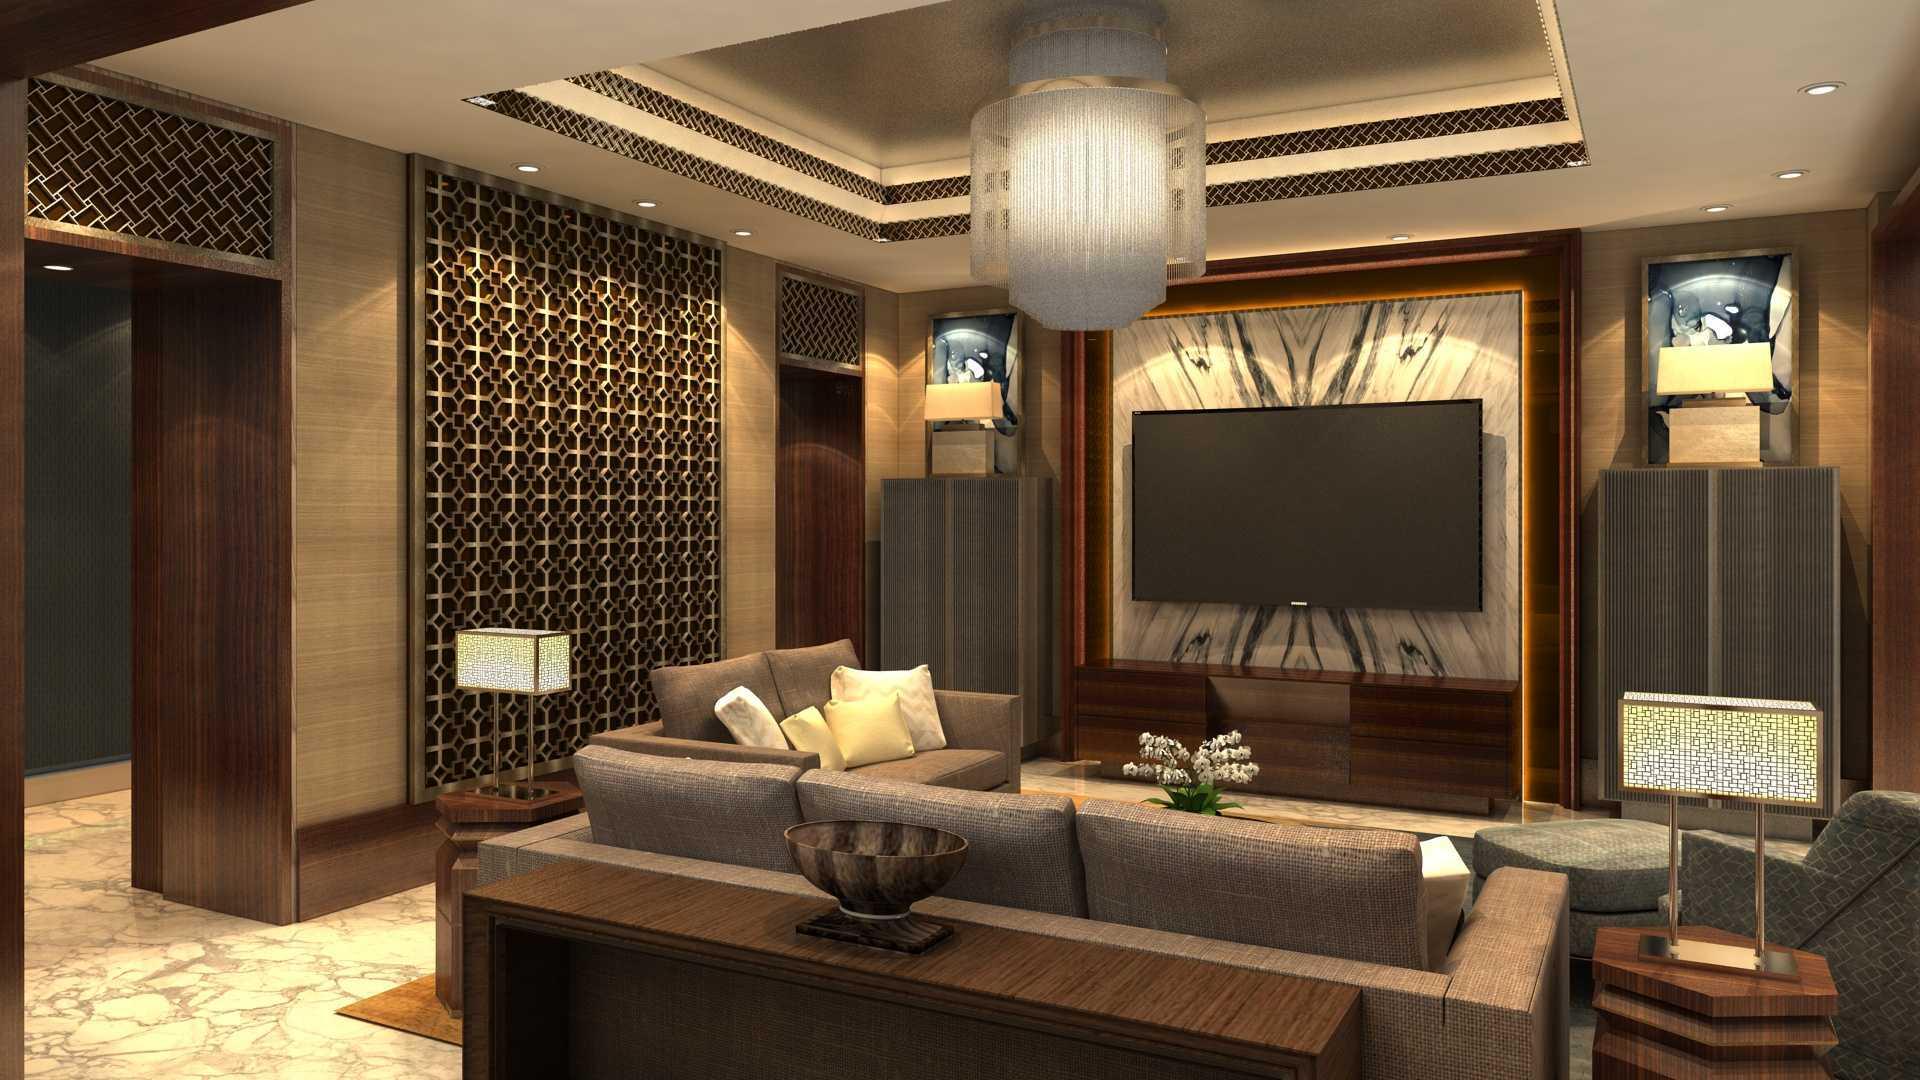 Vin•da•te Mayang Permai Residence Ii - Residential Project (Artist Impression - Construction In Progress) Pantai Indah Kapuk - North Jakarta Pantai Indah Kapuk - North Jakarta Lt Kontemporer  17213